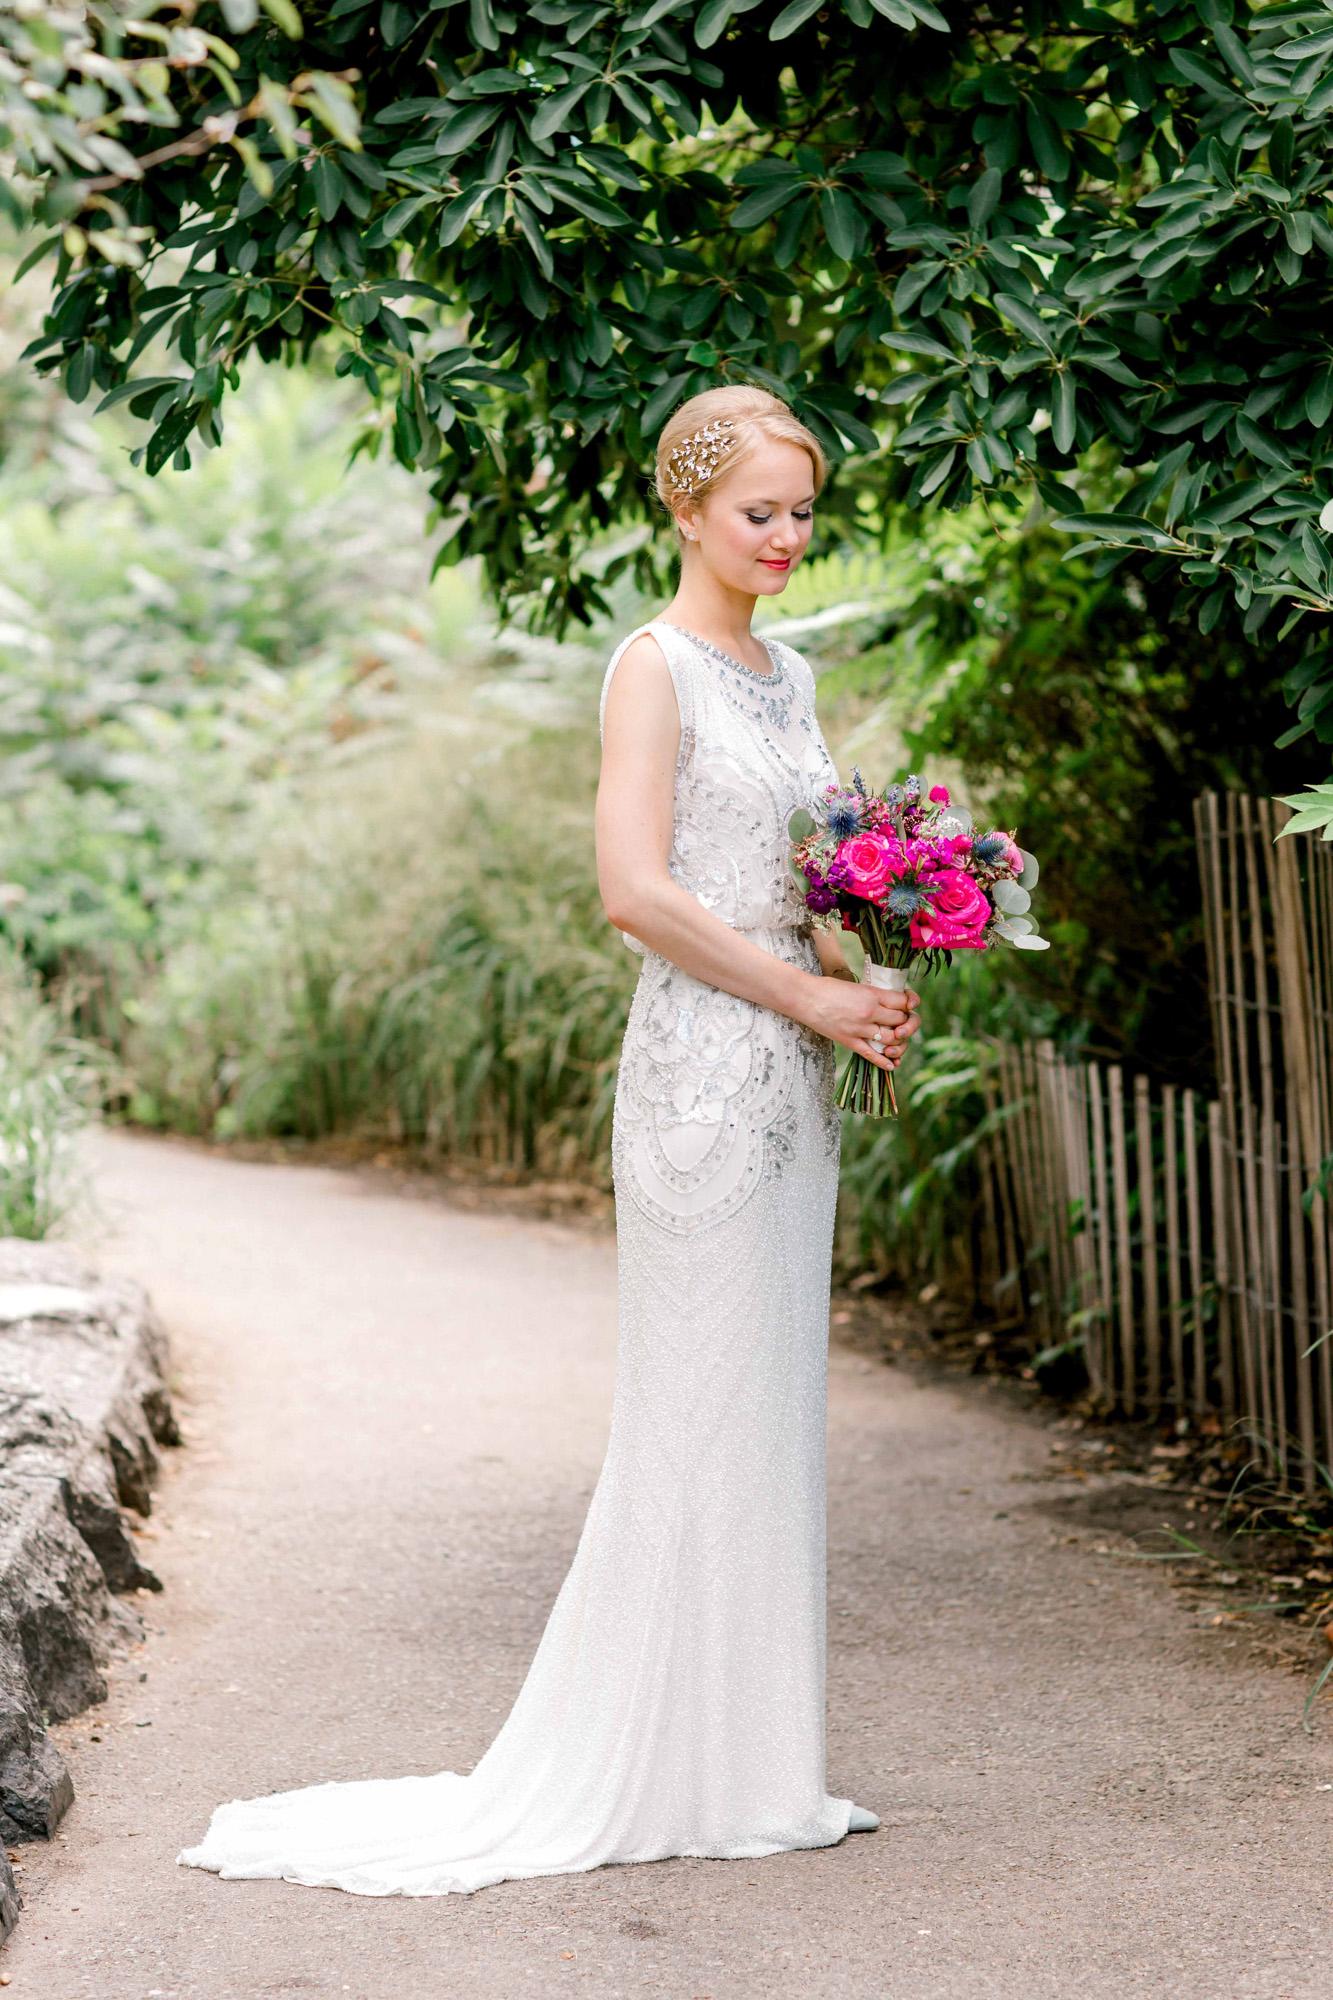 17_Kasey_Paul_Brooklyn_Winery_Wedding_065.jpg